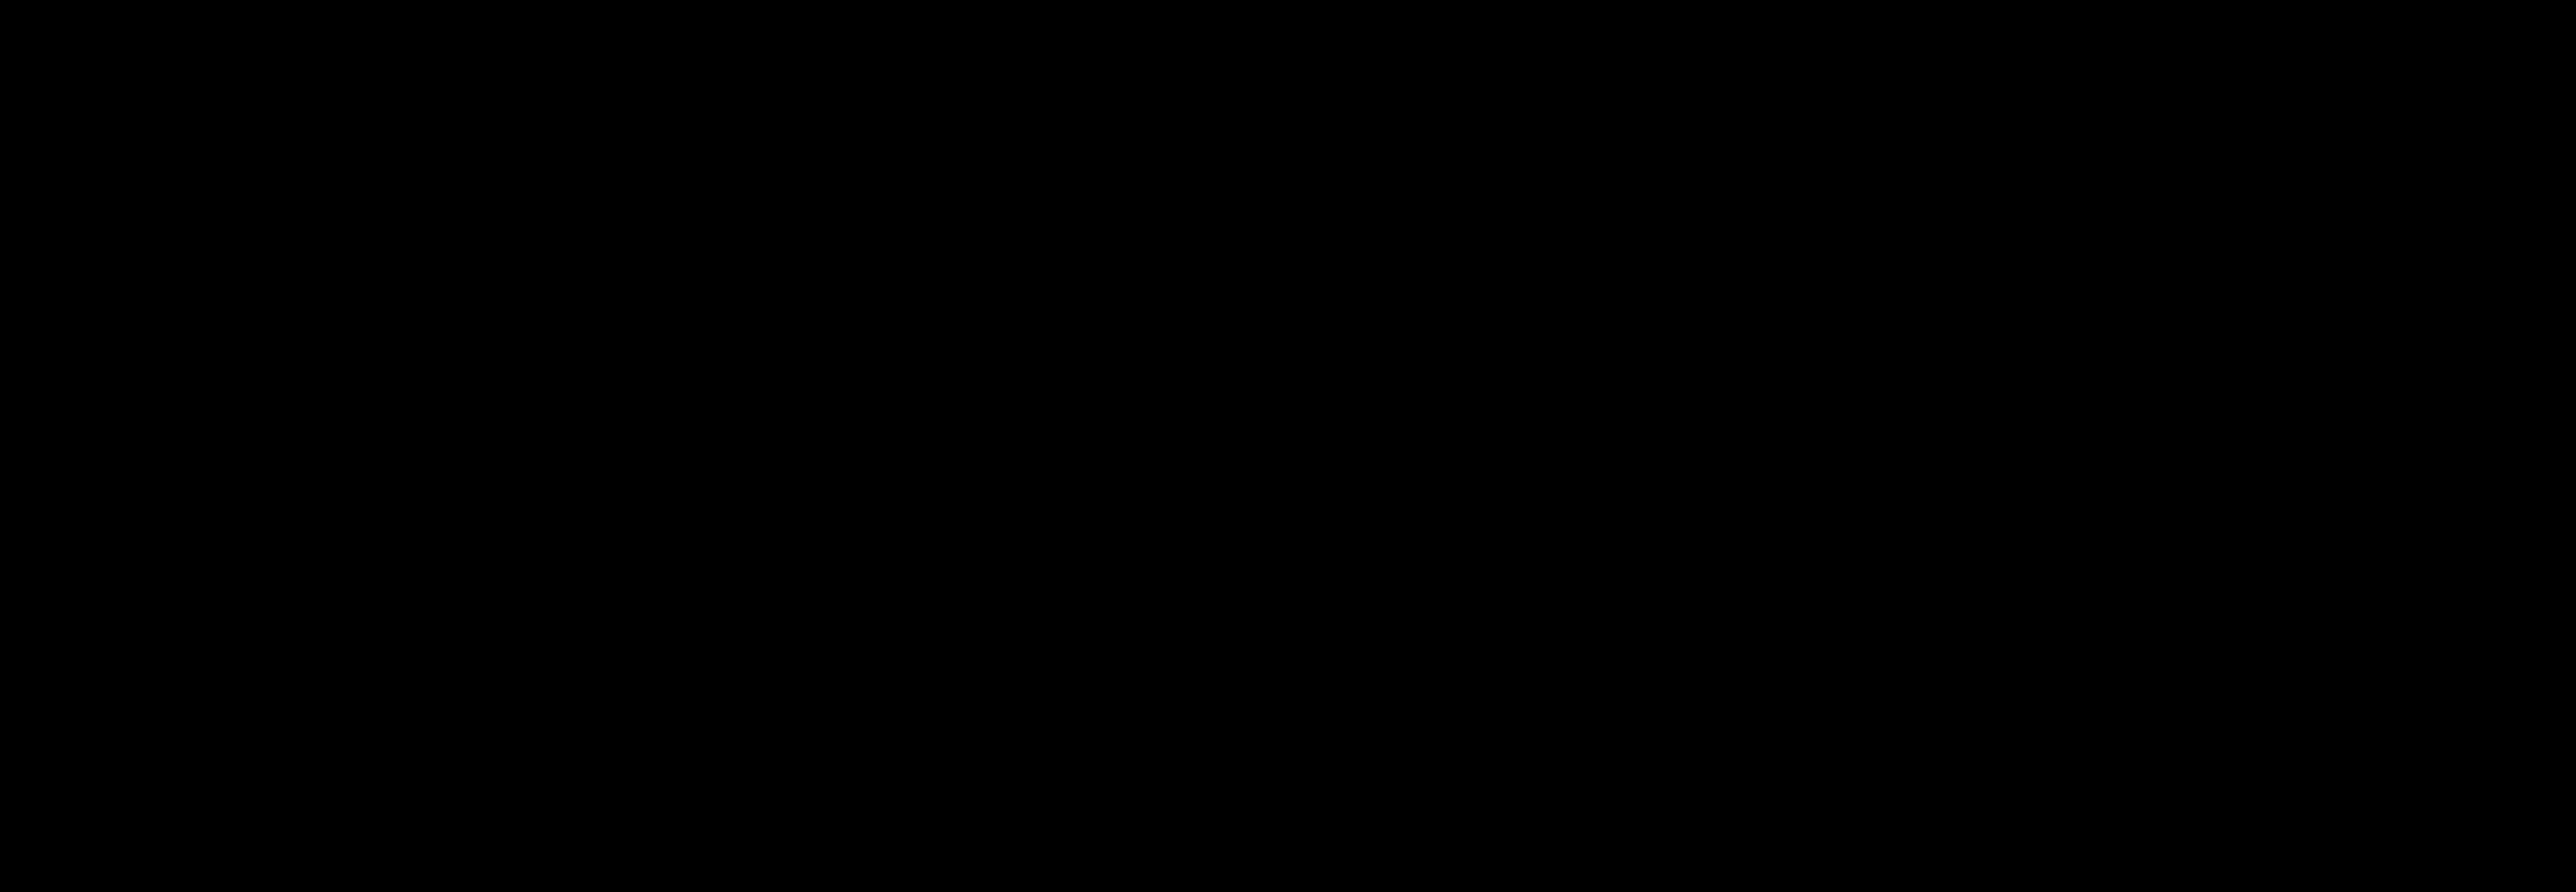 chertezh tsr kreptech